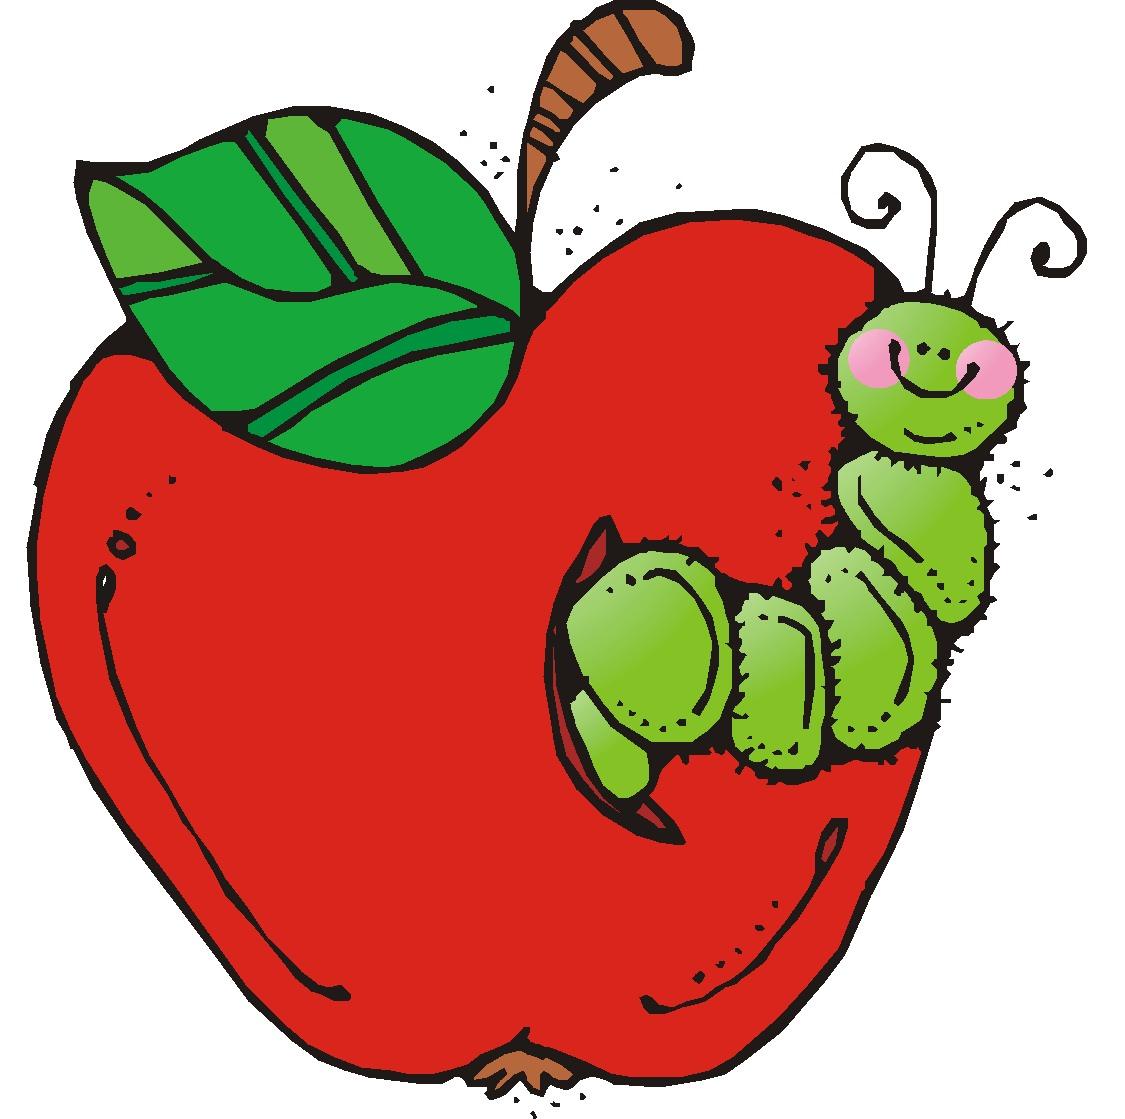 school apple clip art clipart panda free clipart images apple clip art b&w apple clip art free images